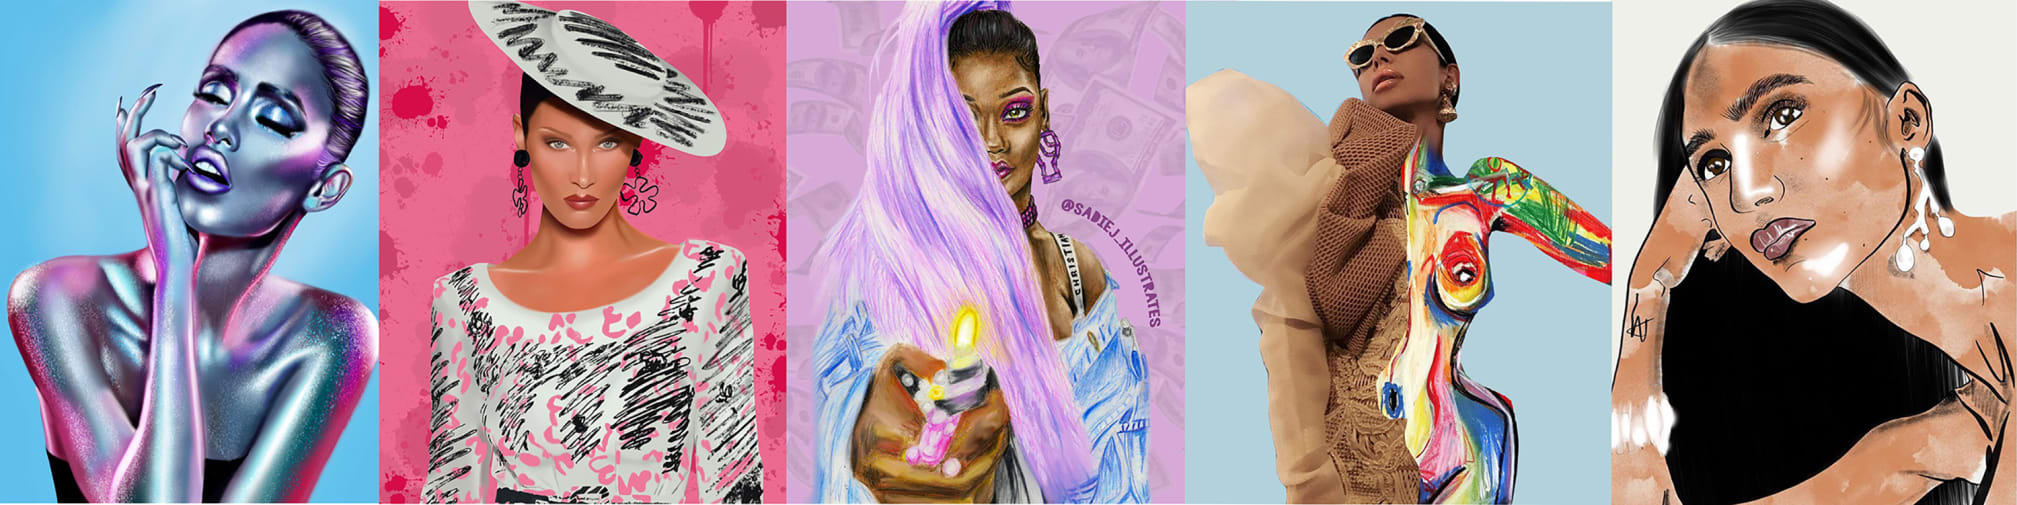 Compilation of five female fashion illustrations